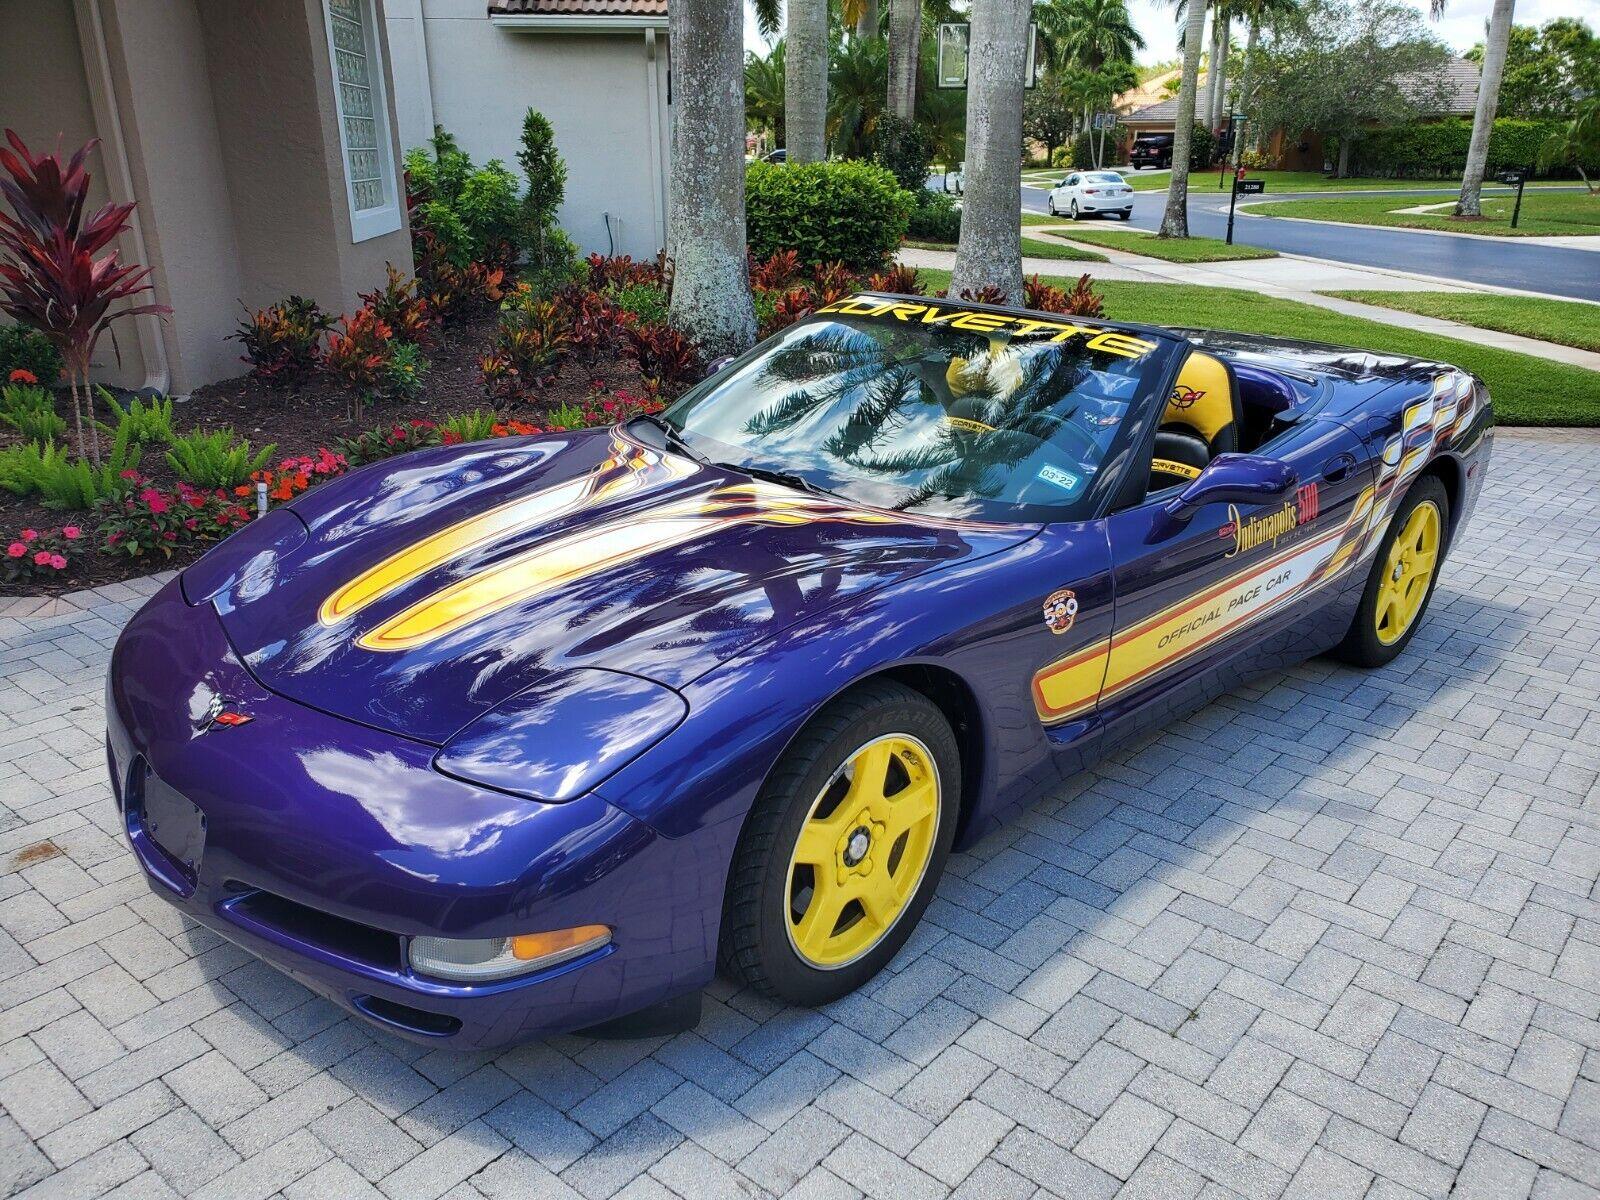 1998  Chevrolet Corvette   | C5 Corvette Photo 1